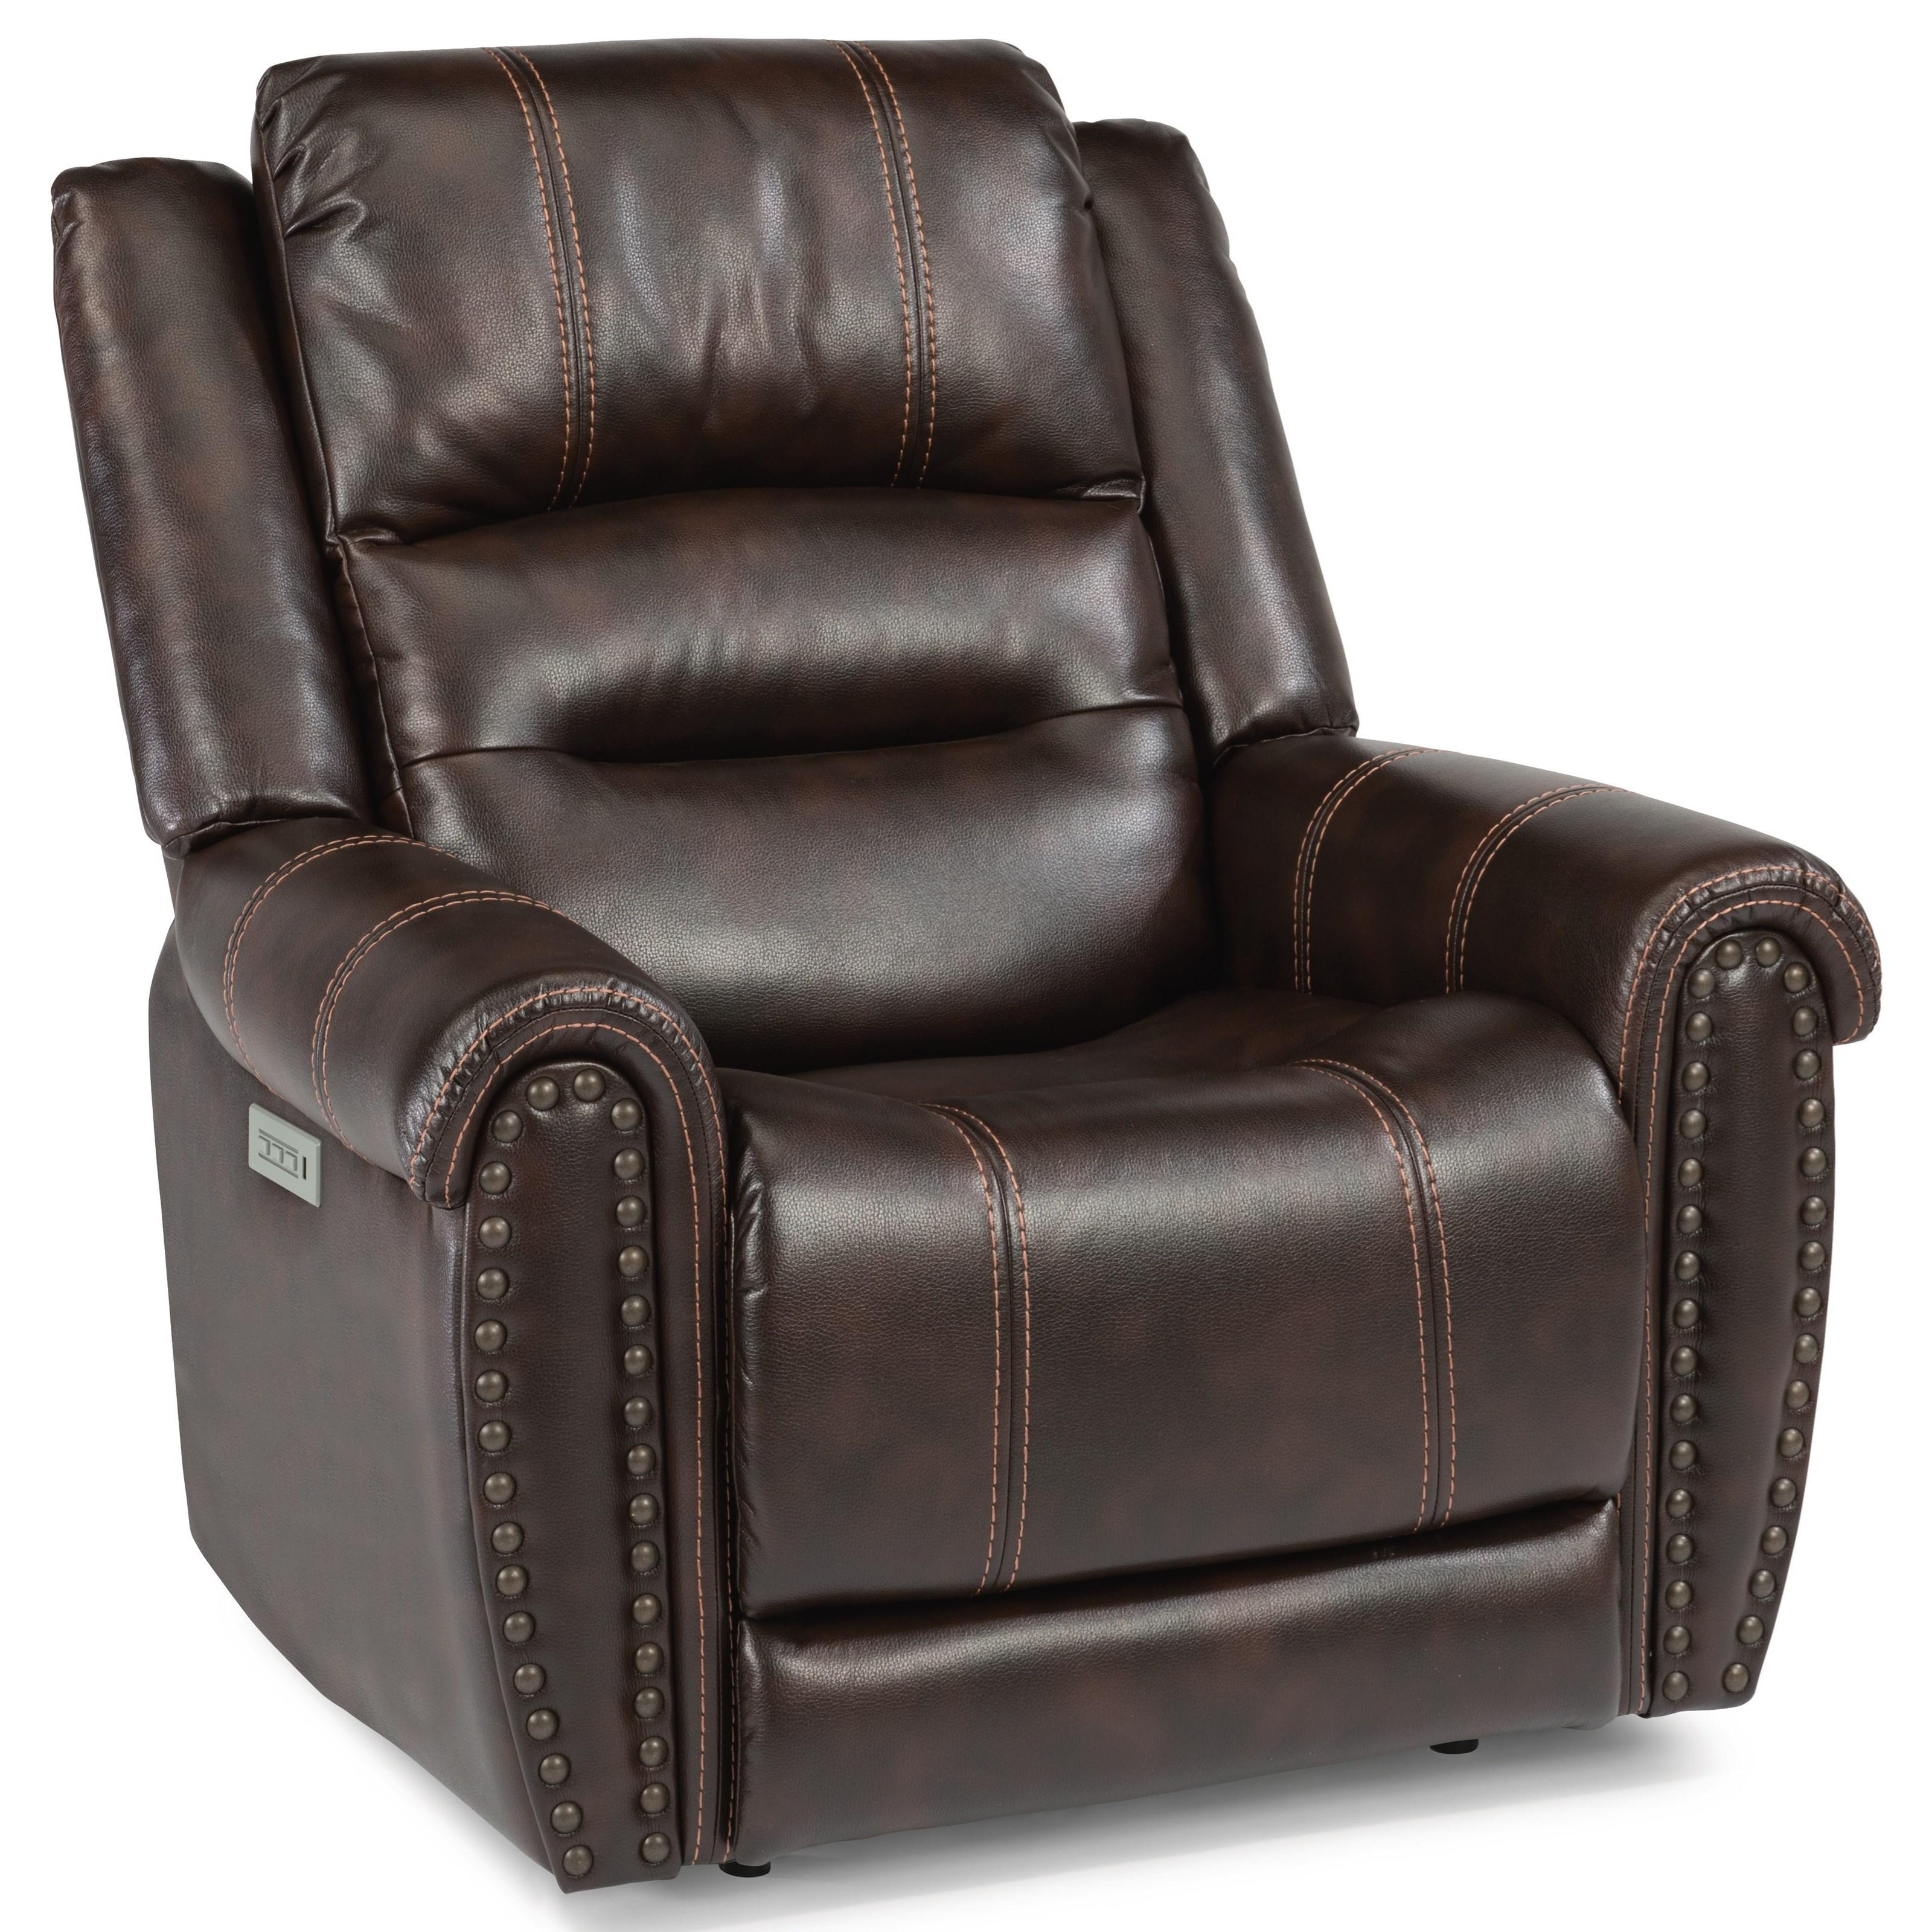 Flexsteel Furniture Uk: Oscar 1590-50PH Power Recliner With